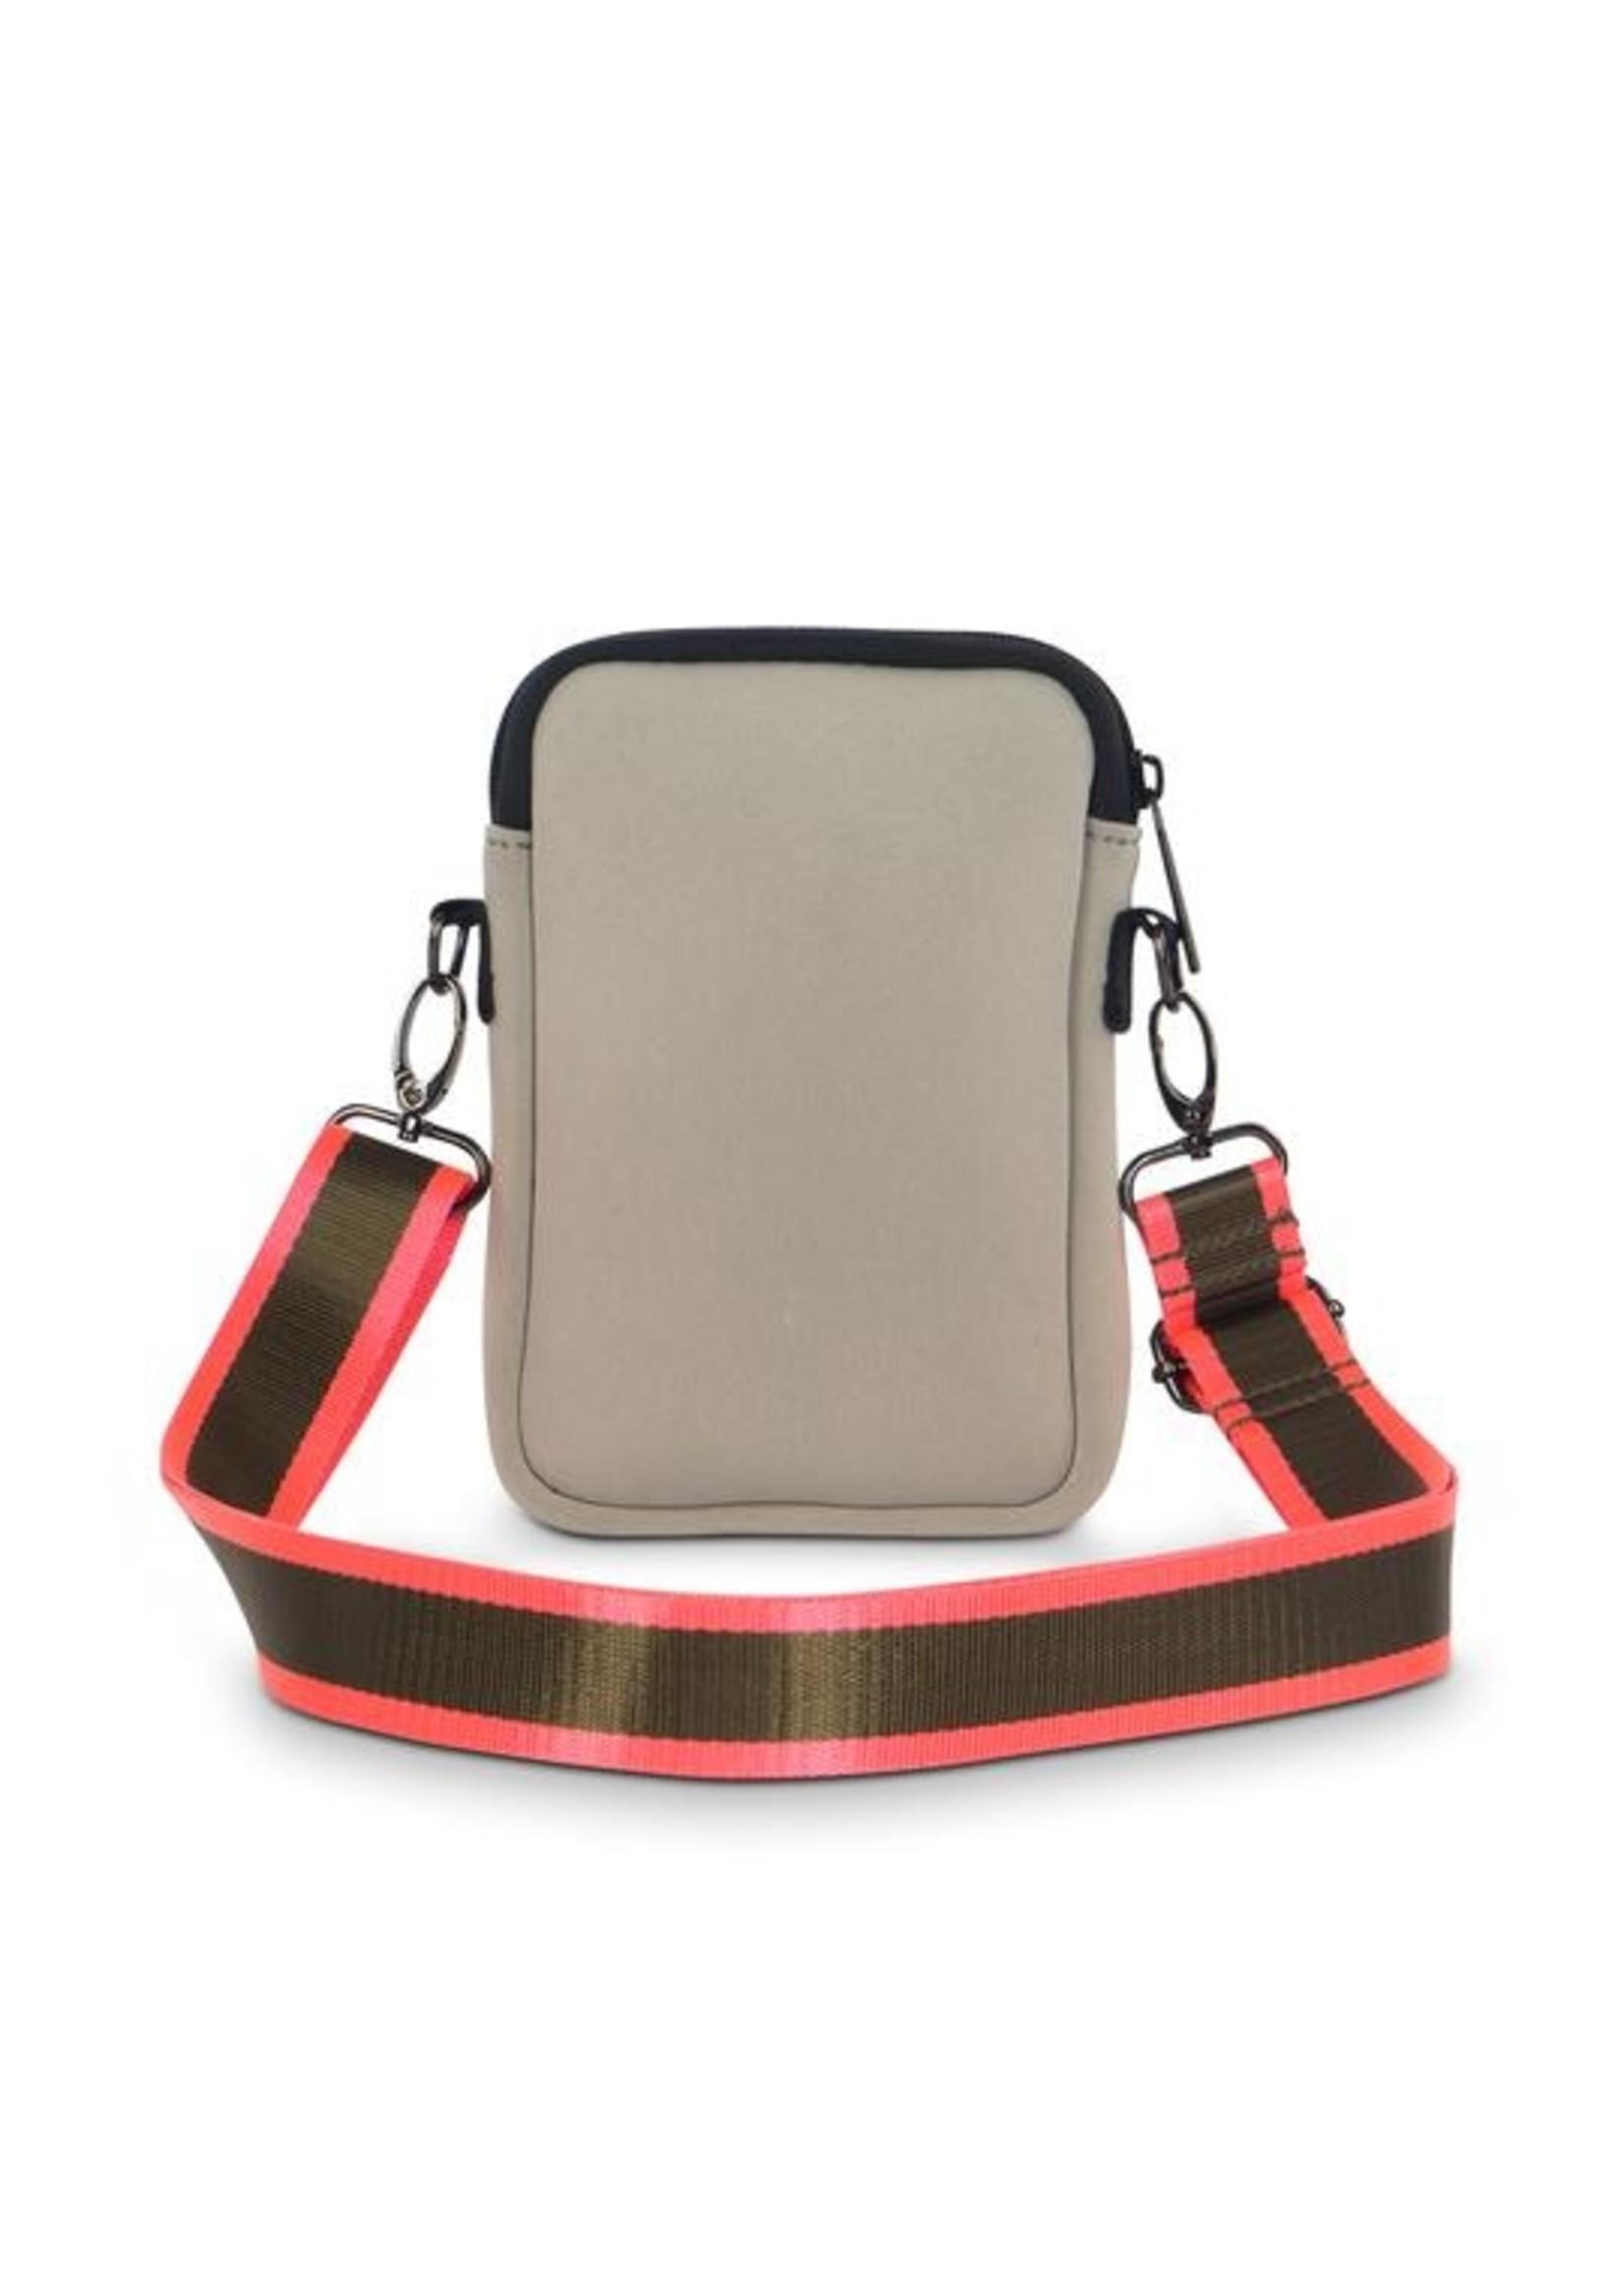 Green/pink stripe phone bag